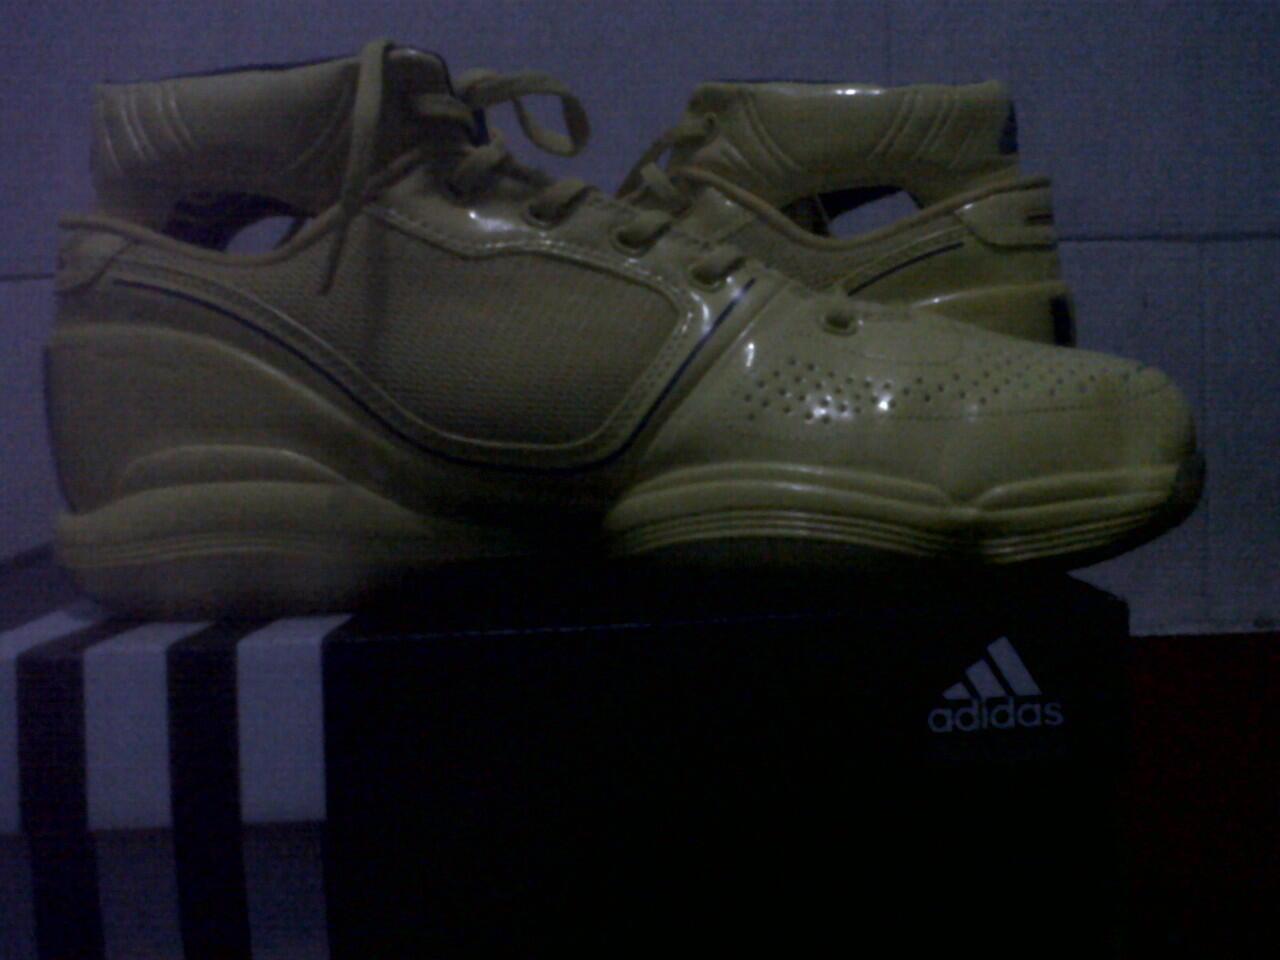 jual Adidas Men's Basketball Shoes Adizero Rose 1.0 All Star Yellow G21559